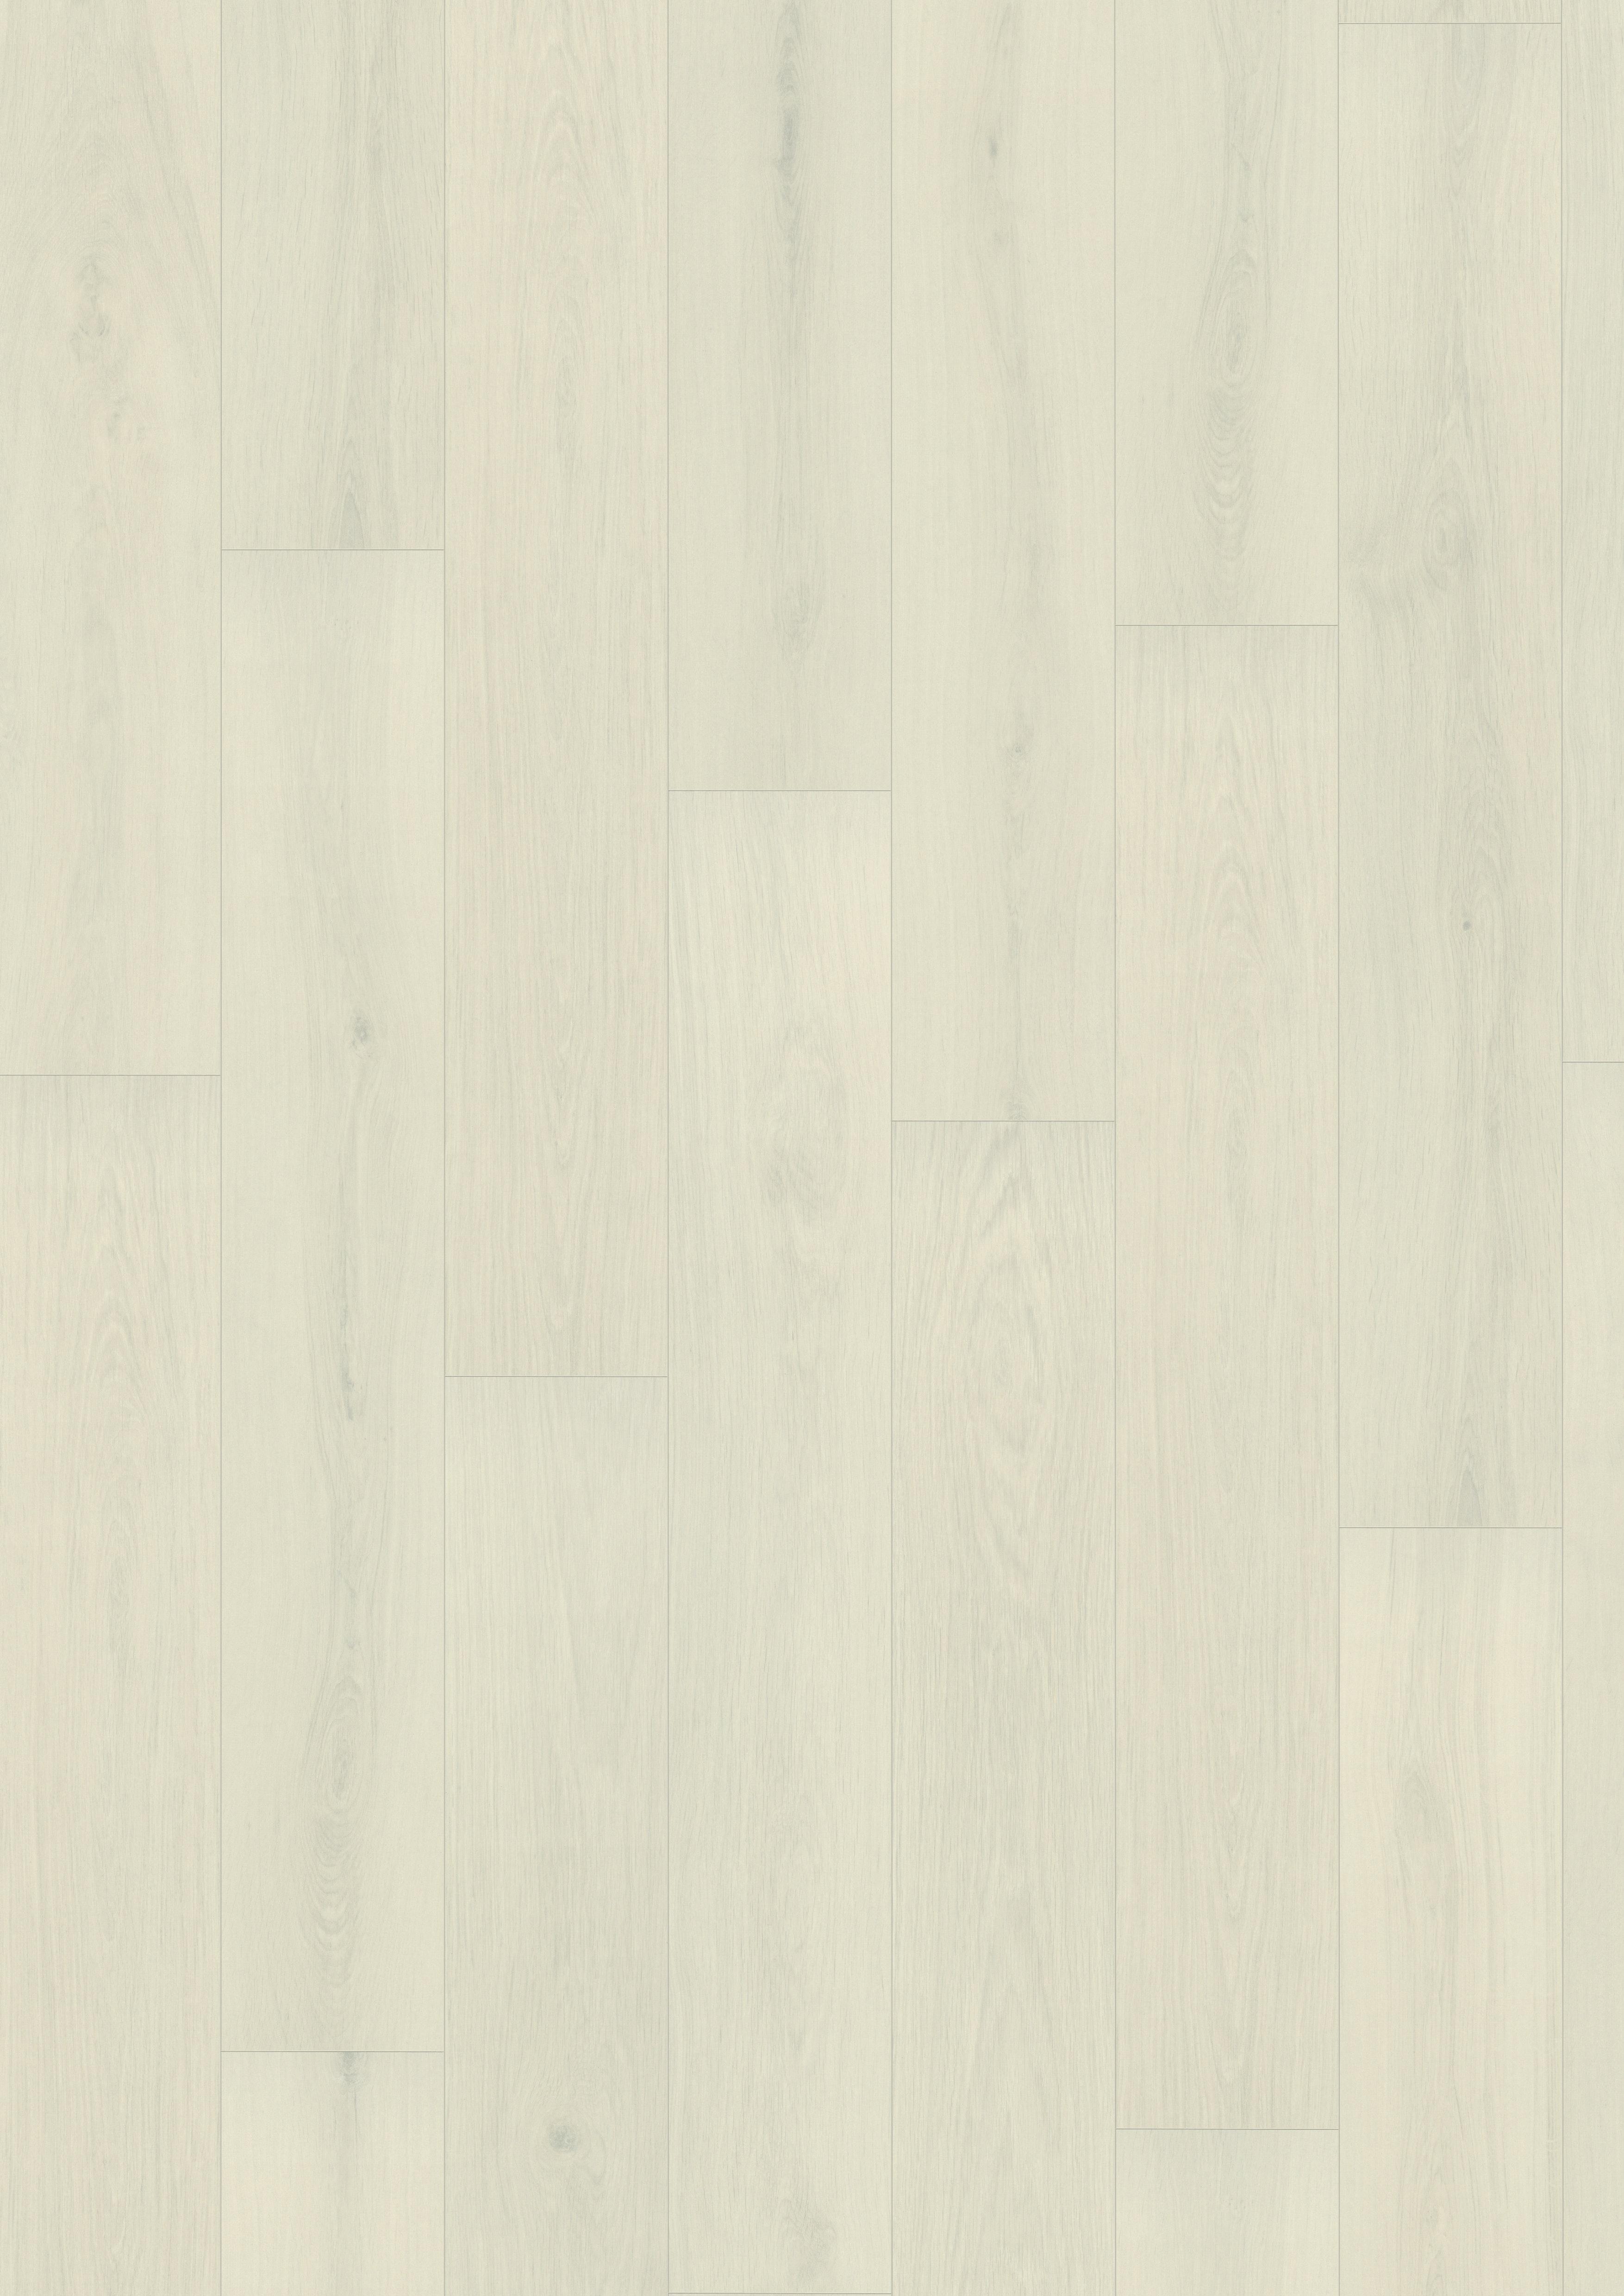 Laminatgolv Cello Taiga Ek 1-Stav KL33 10mm 1,74m²